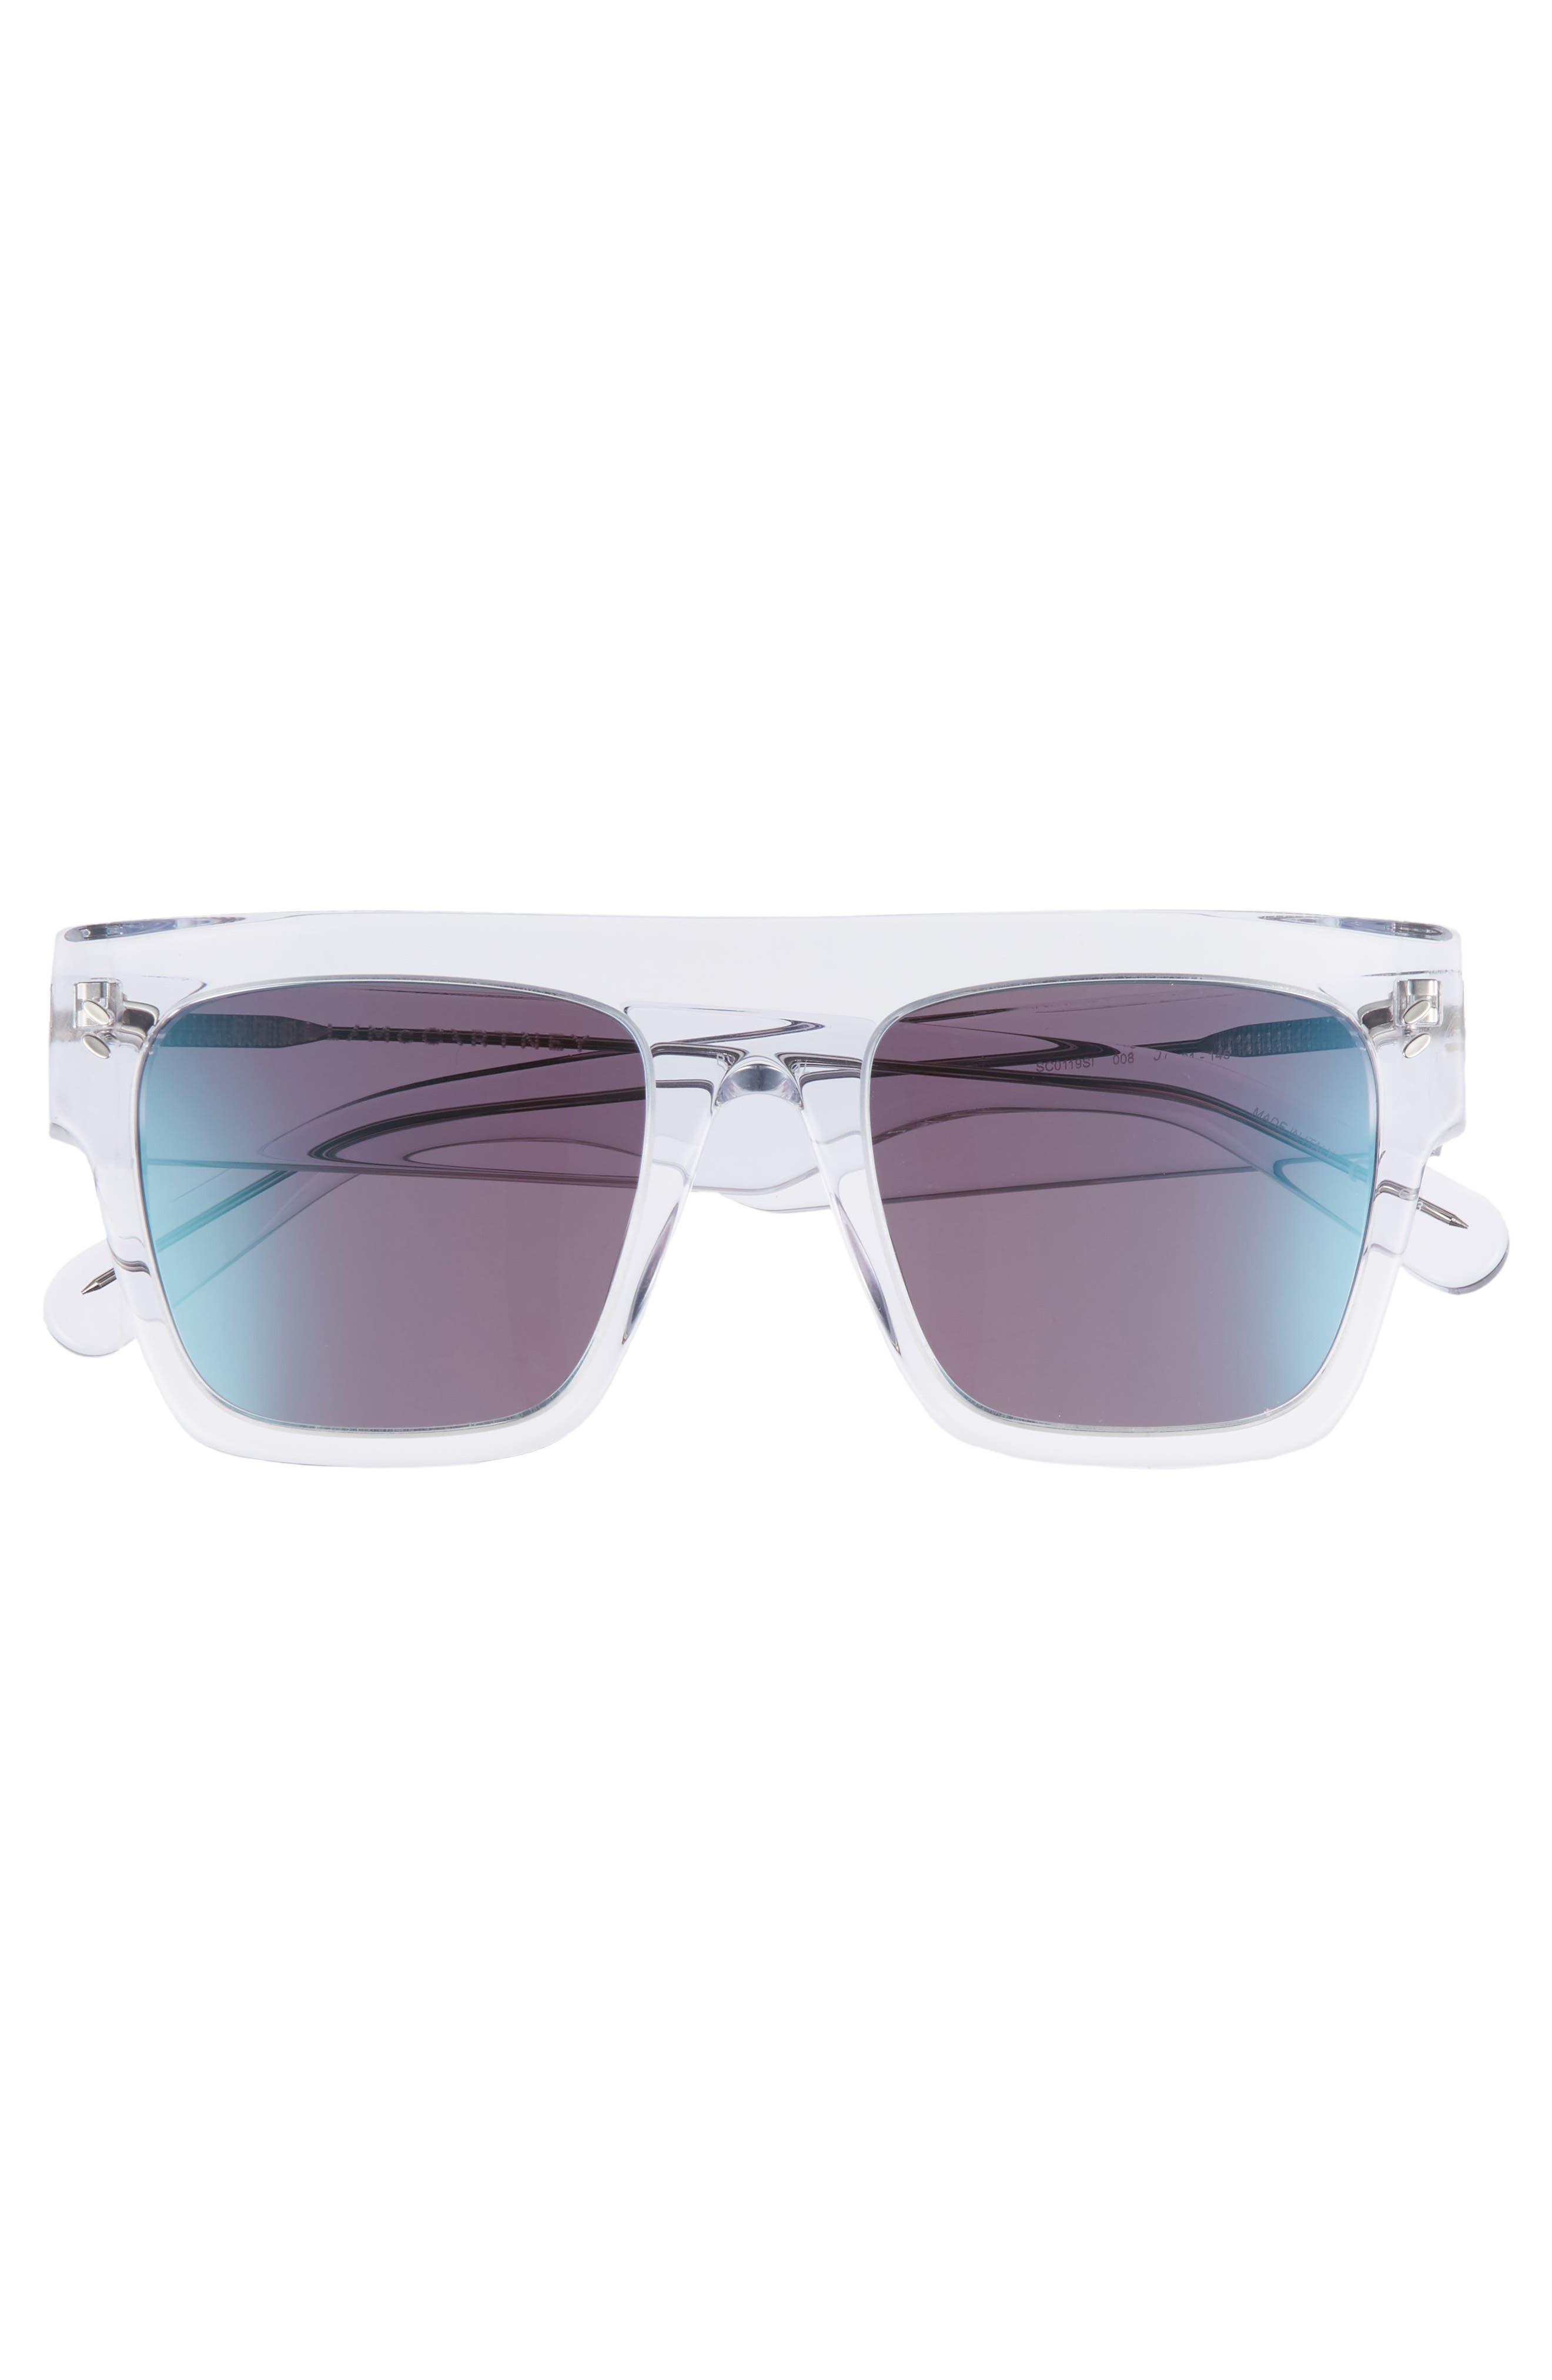 51mm Flattop Sunglasses,                             Alternate thumbnail 3, color,                             Crystal